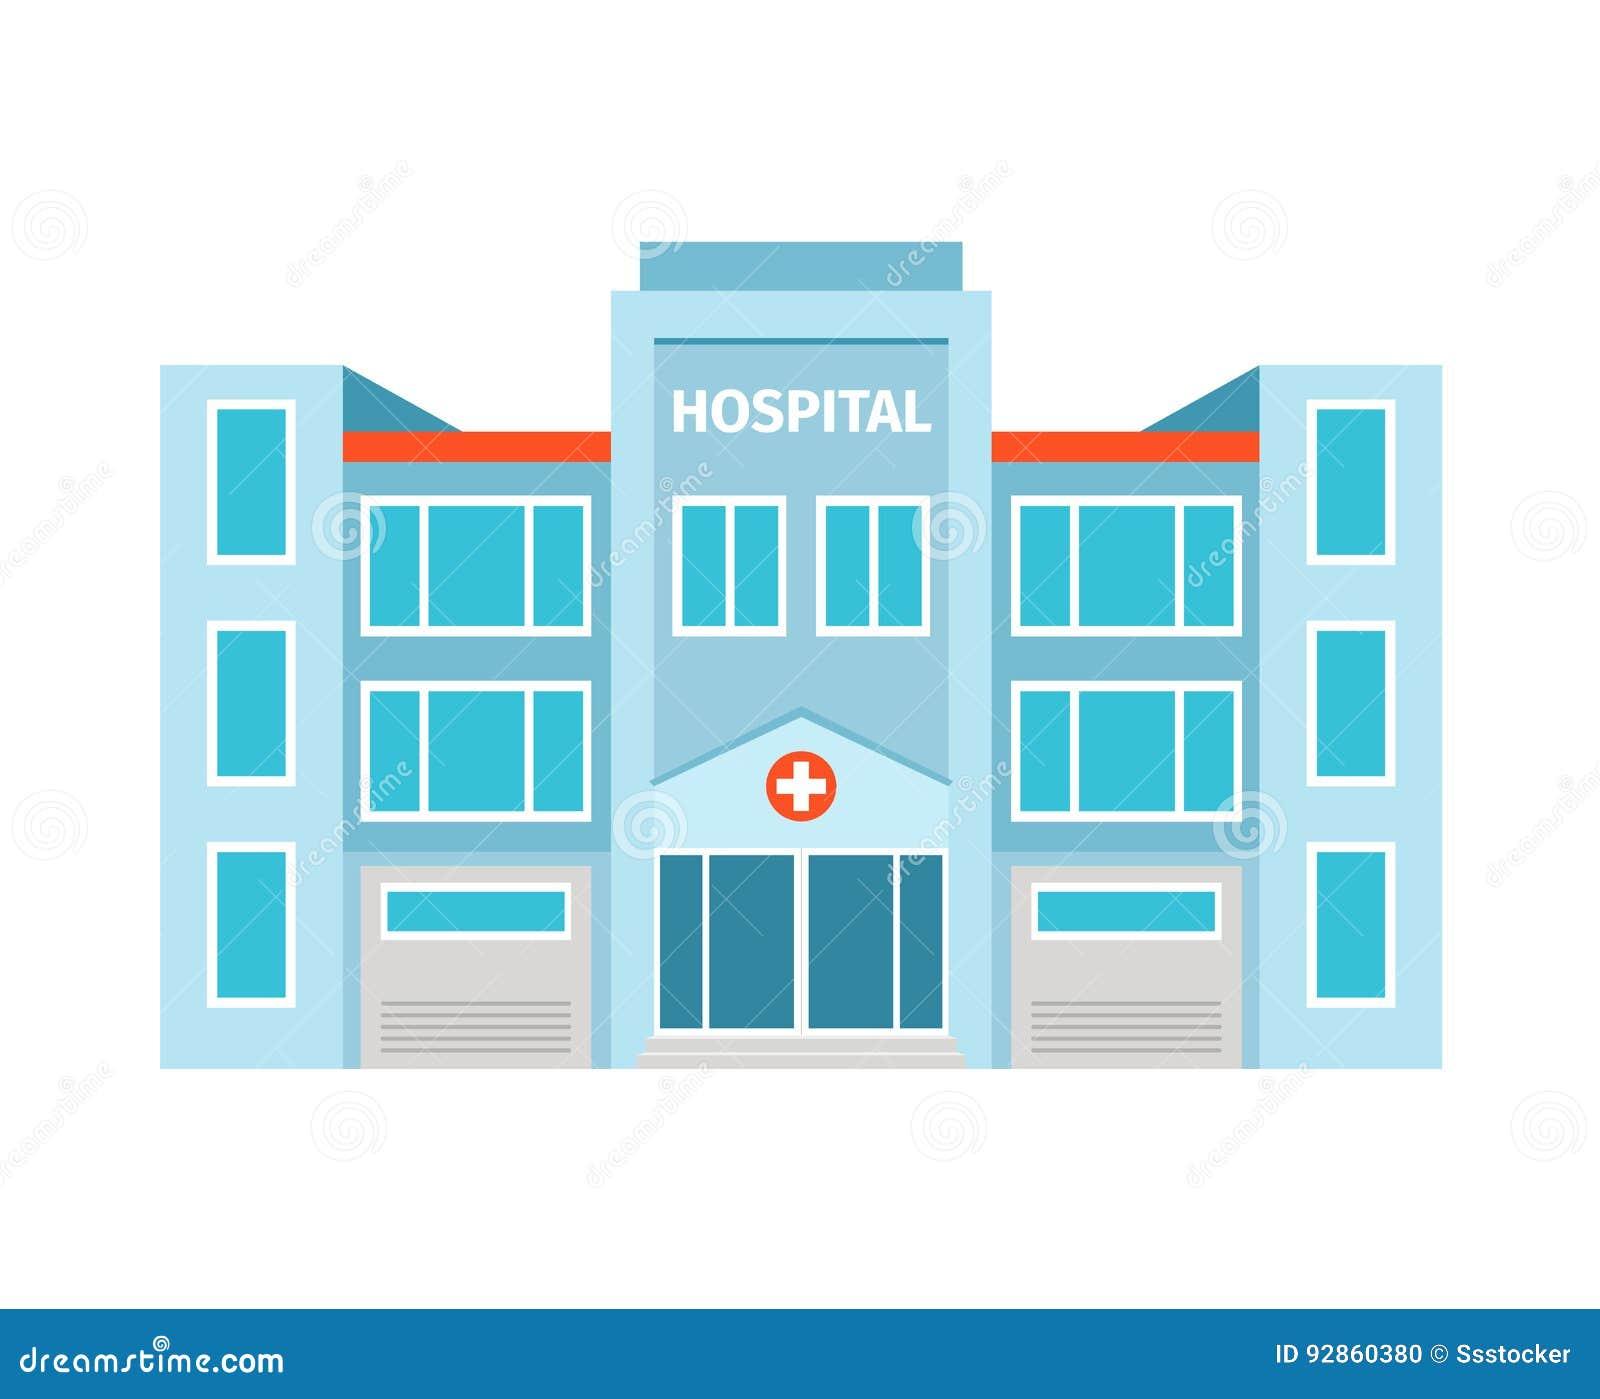 Hospital flat building icon